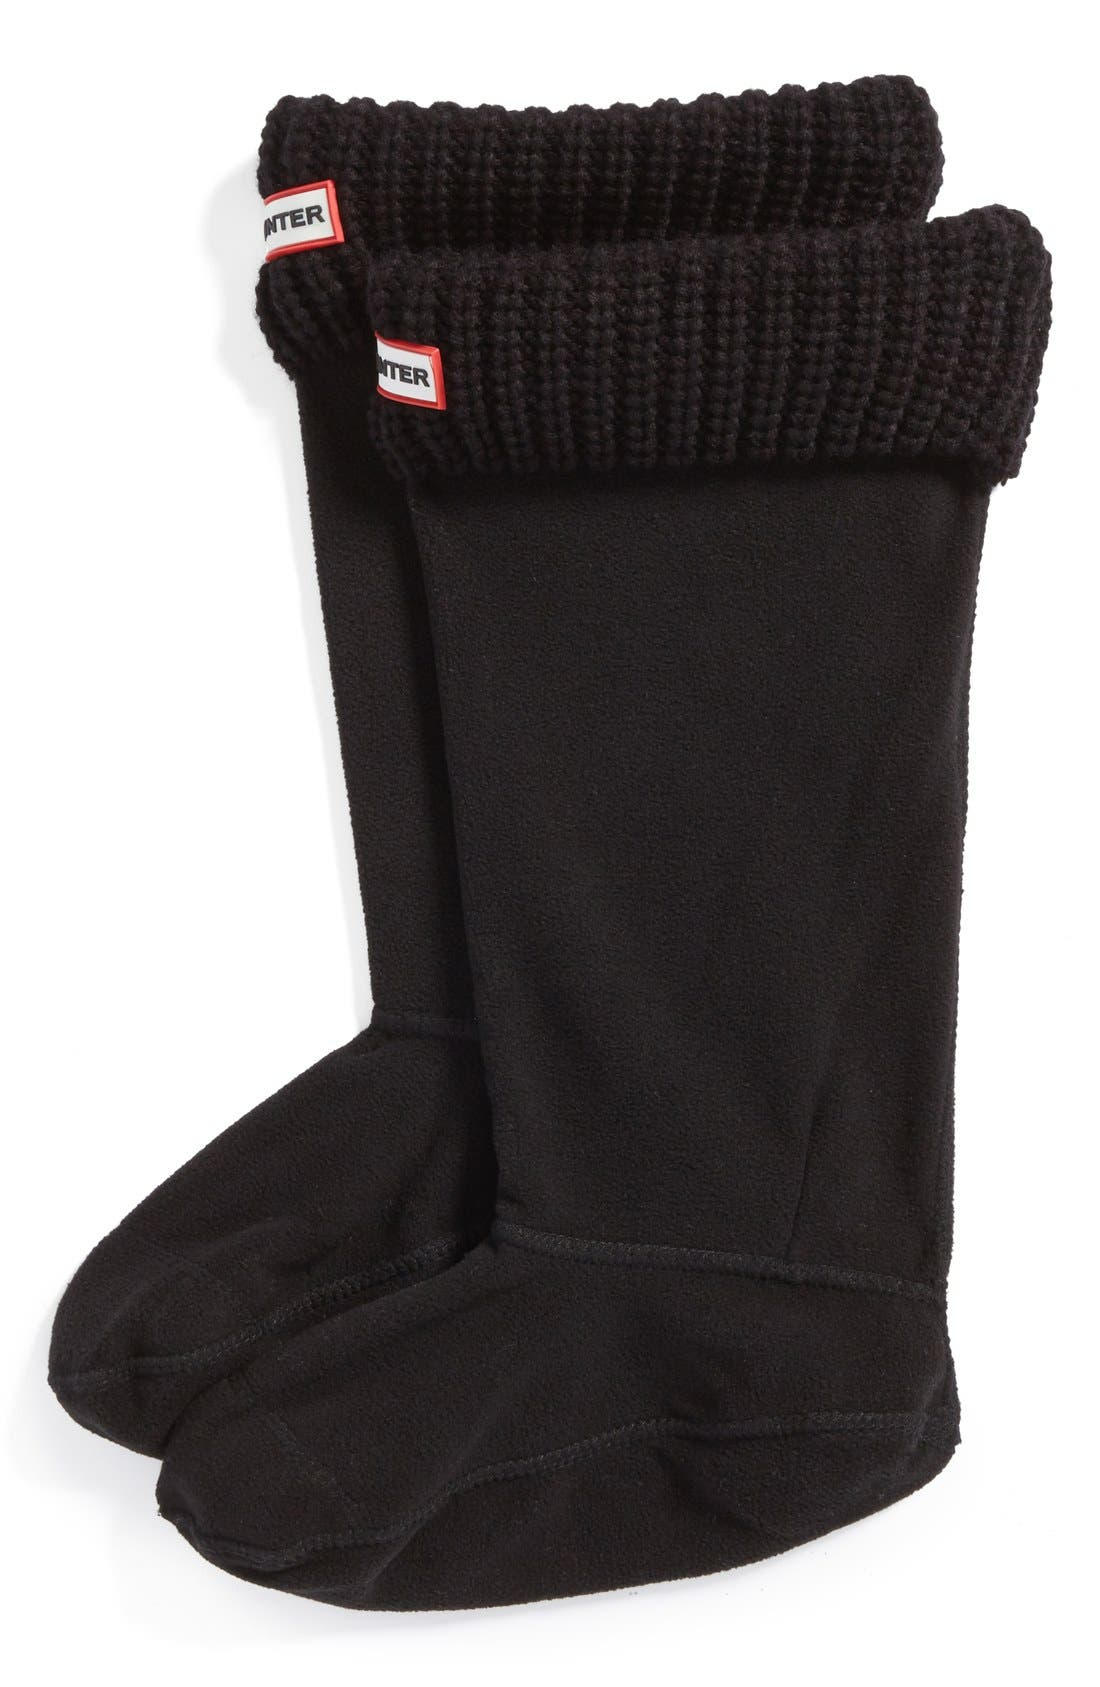 Image of Hunter Cardigan Knit Cuff Welly Boot Socks - Tall